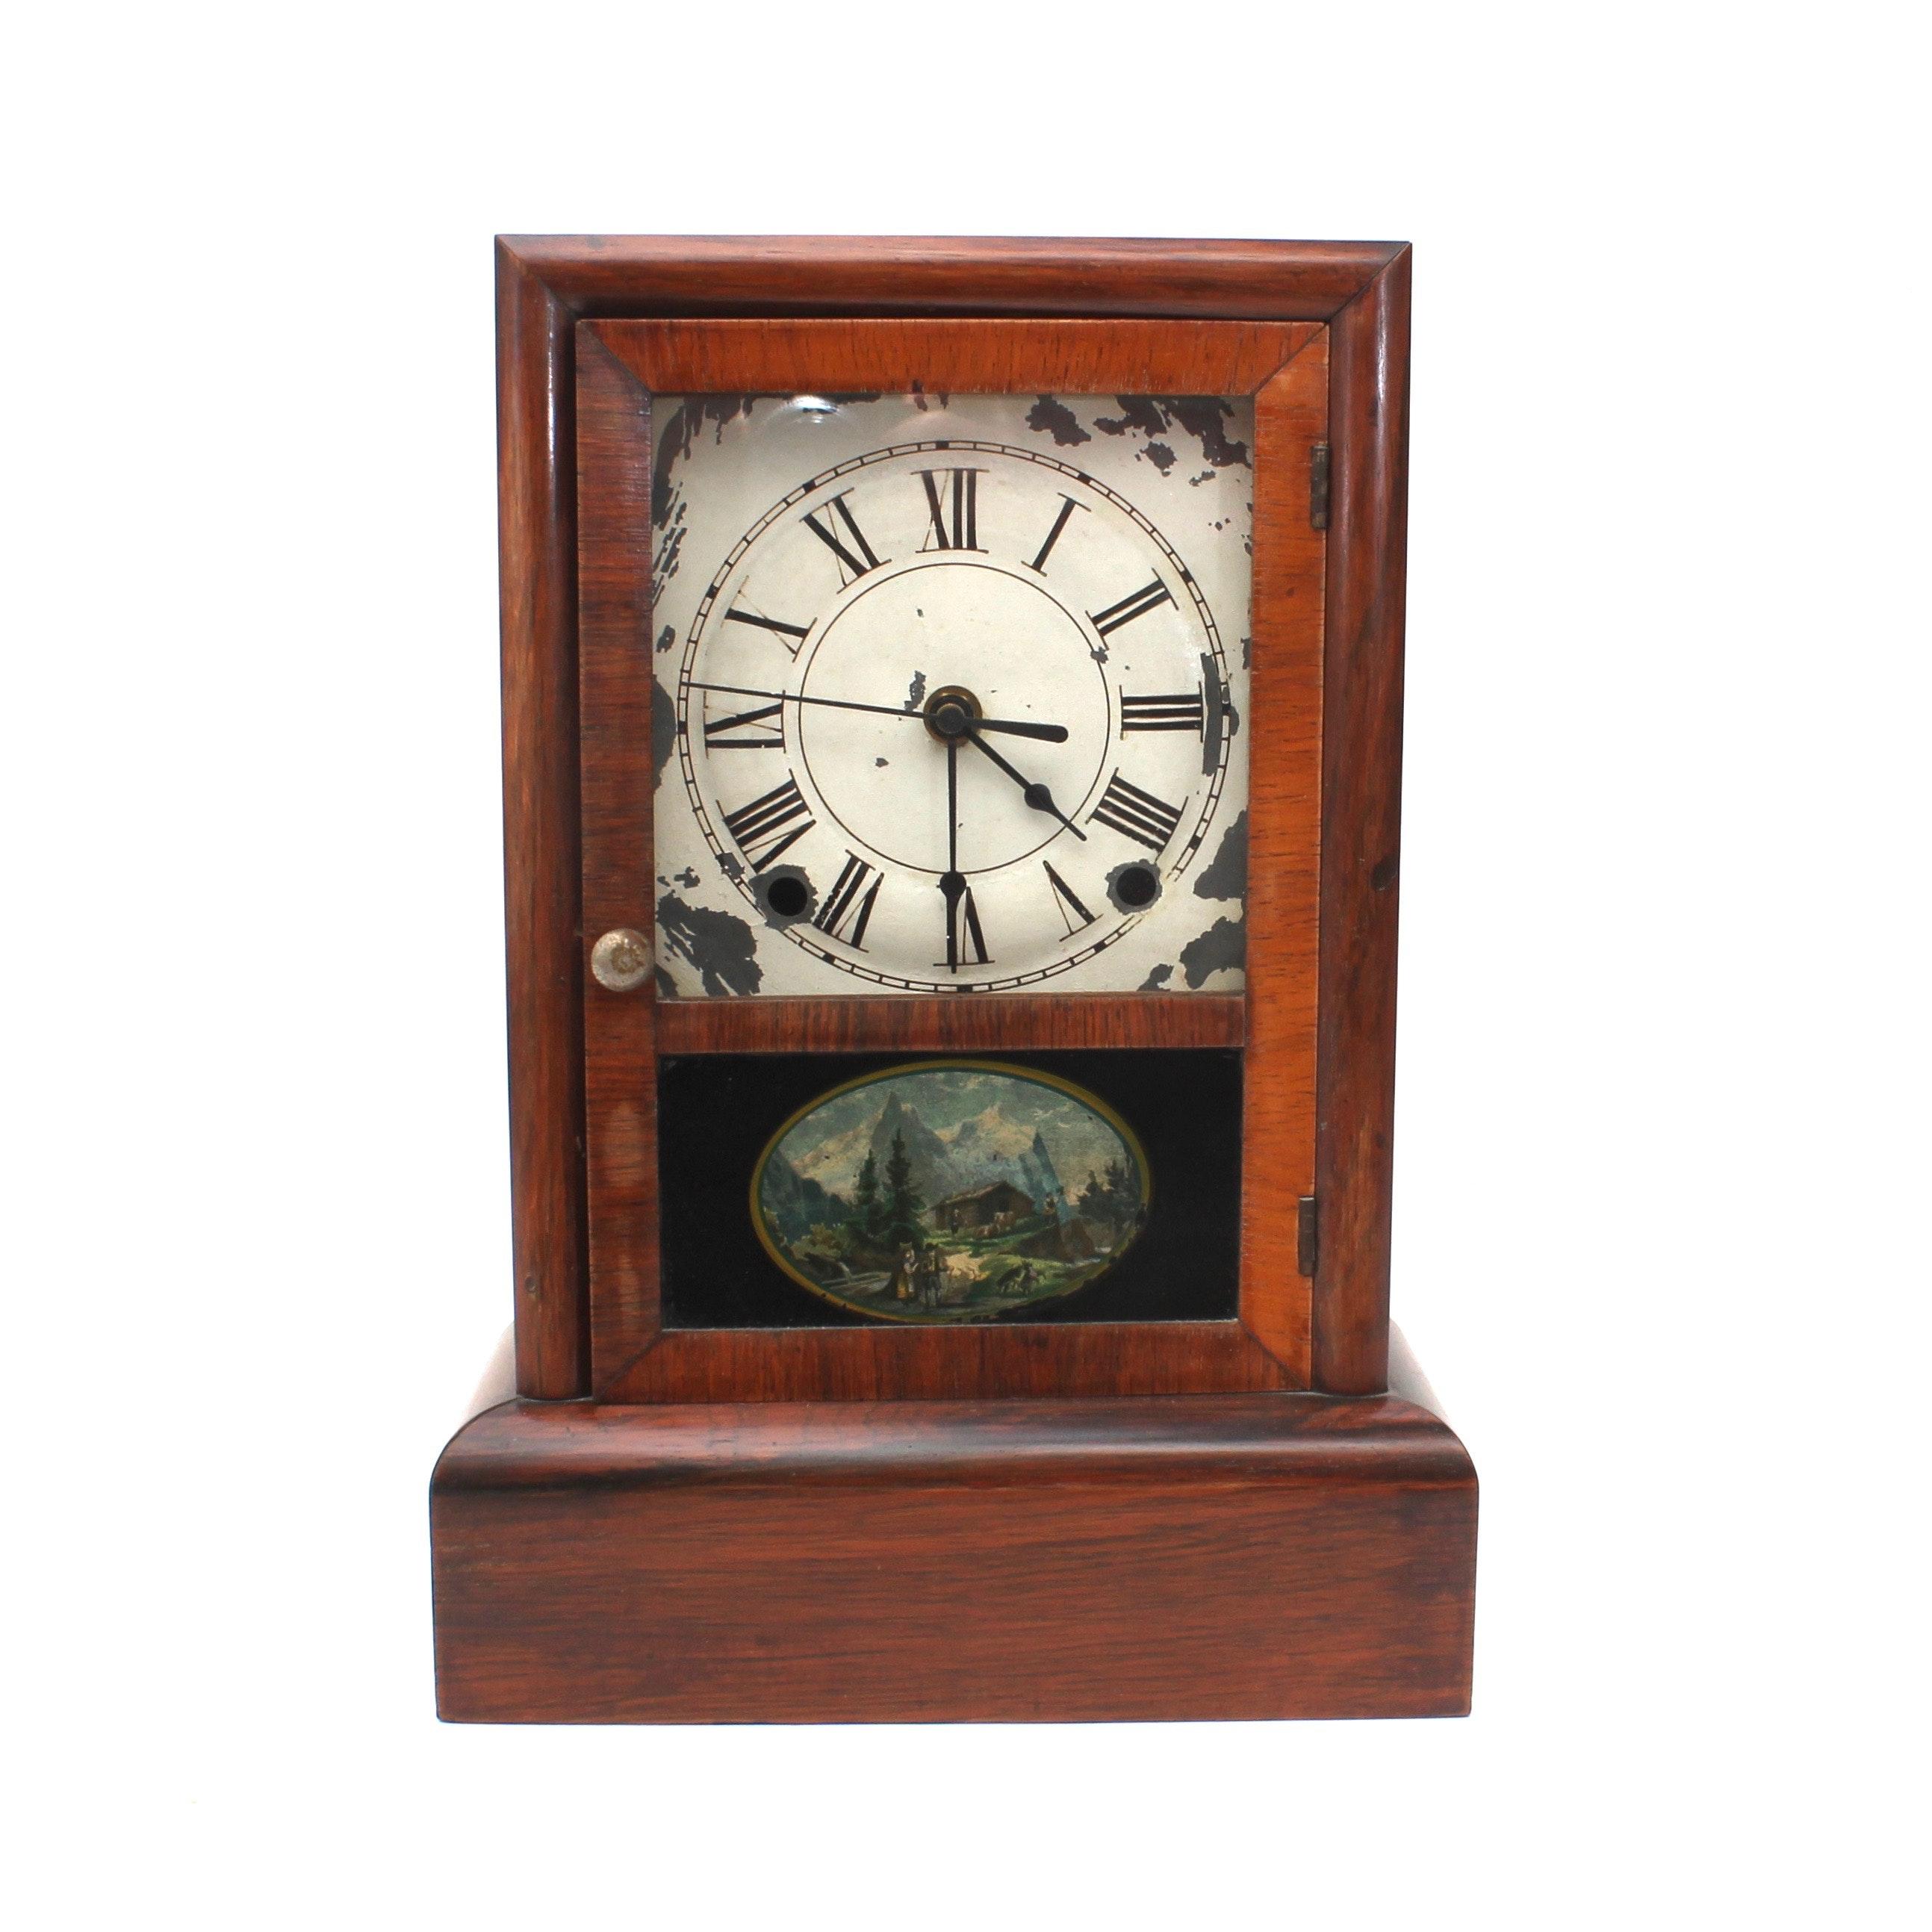 Vintage Mahogany Wooden Mantel Clock